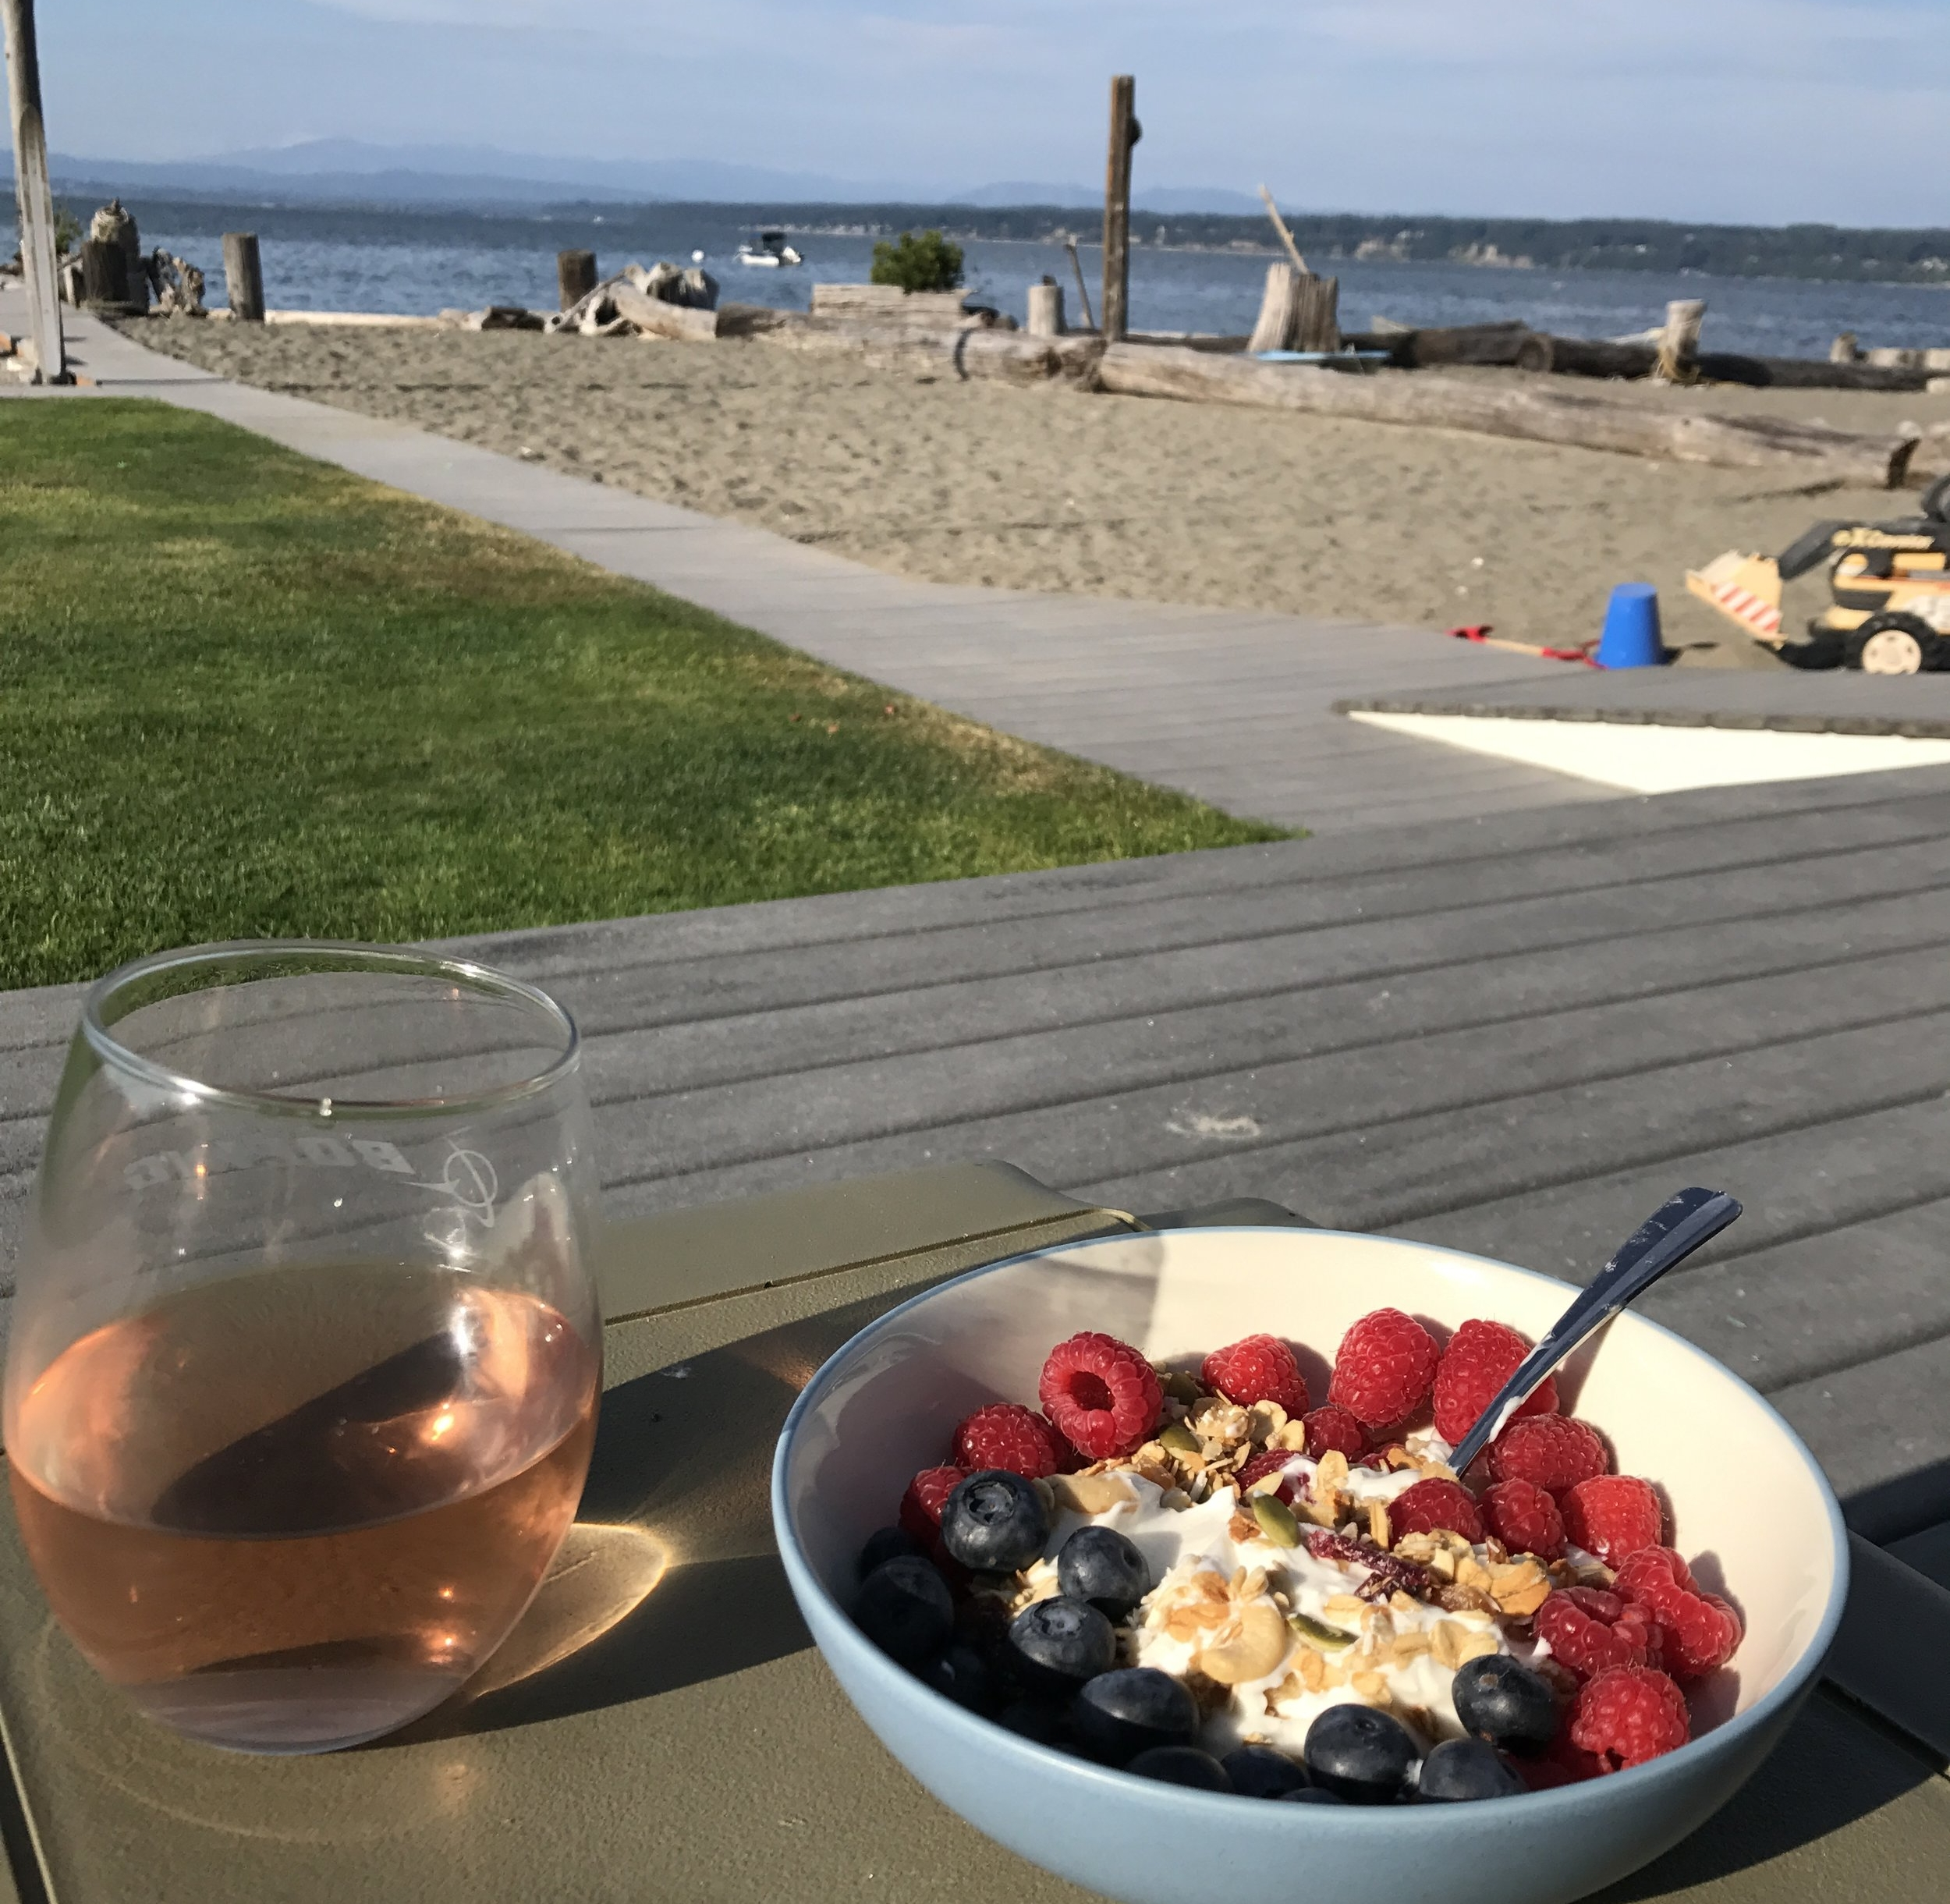 Because rose balances out fruit and greek yogurt well